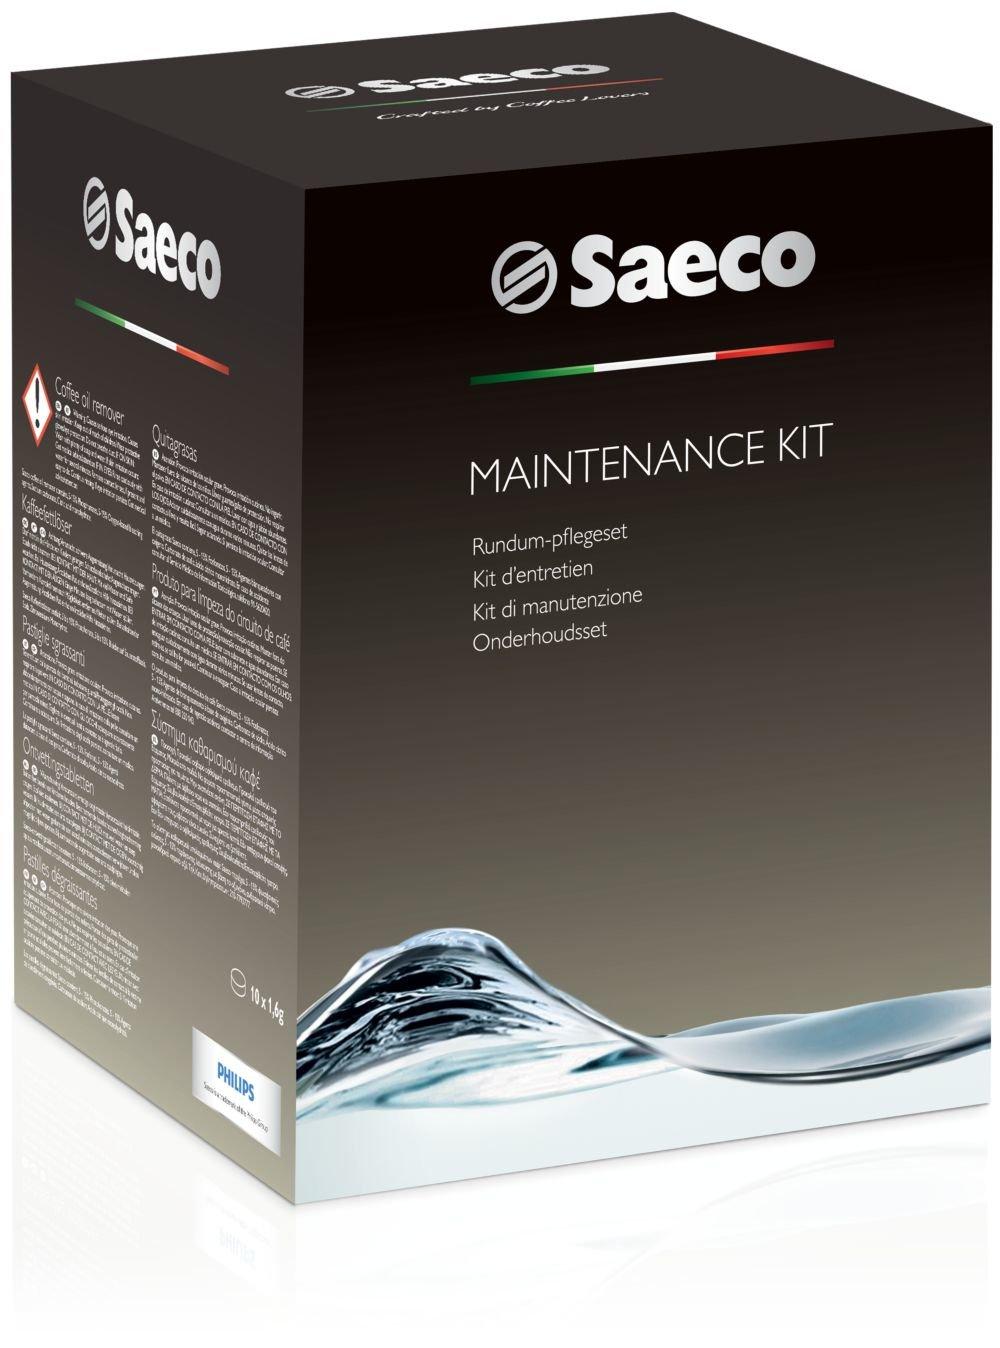 Philips-CA670600-Kit-Pflege-Saeco